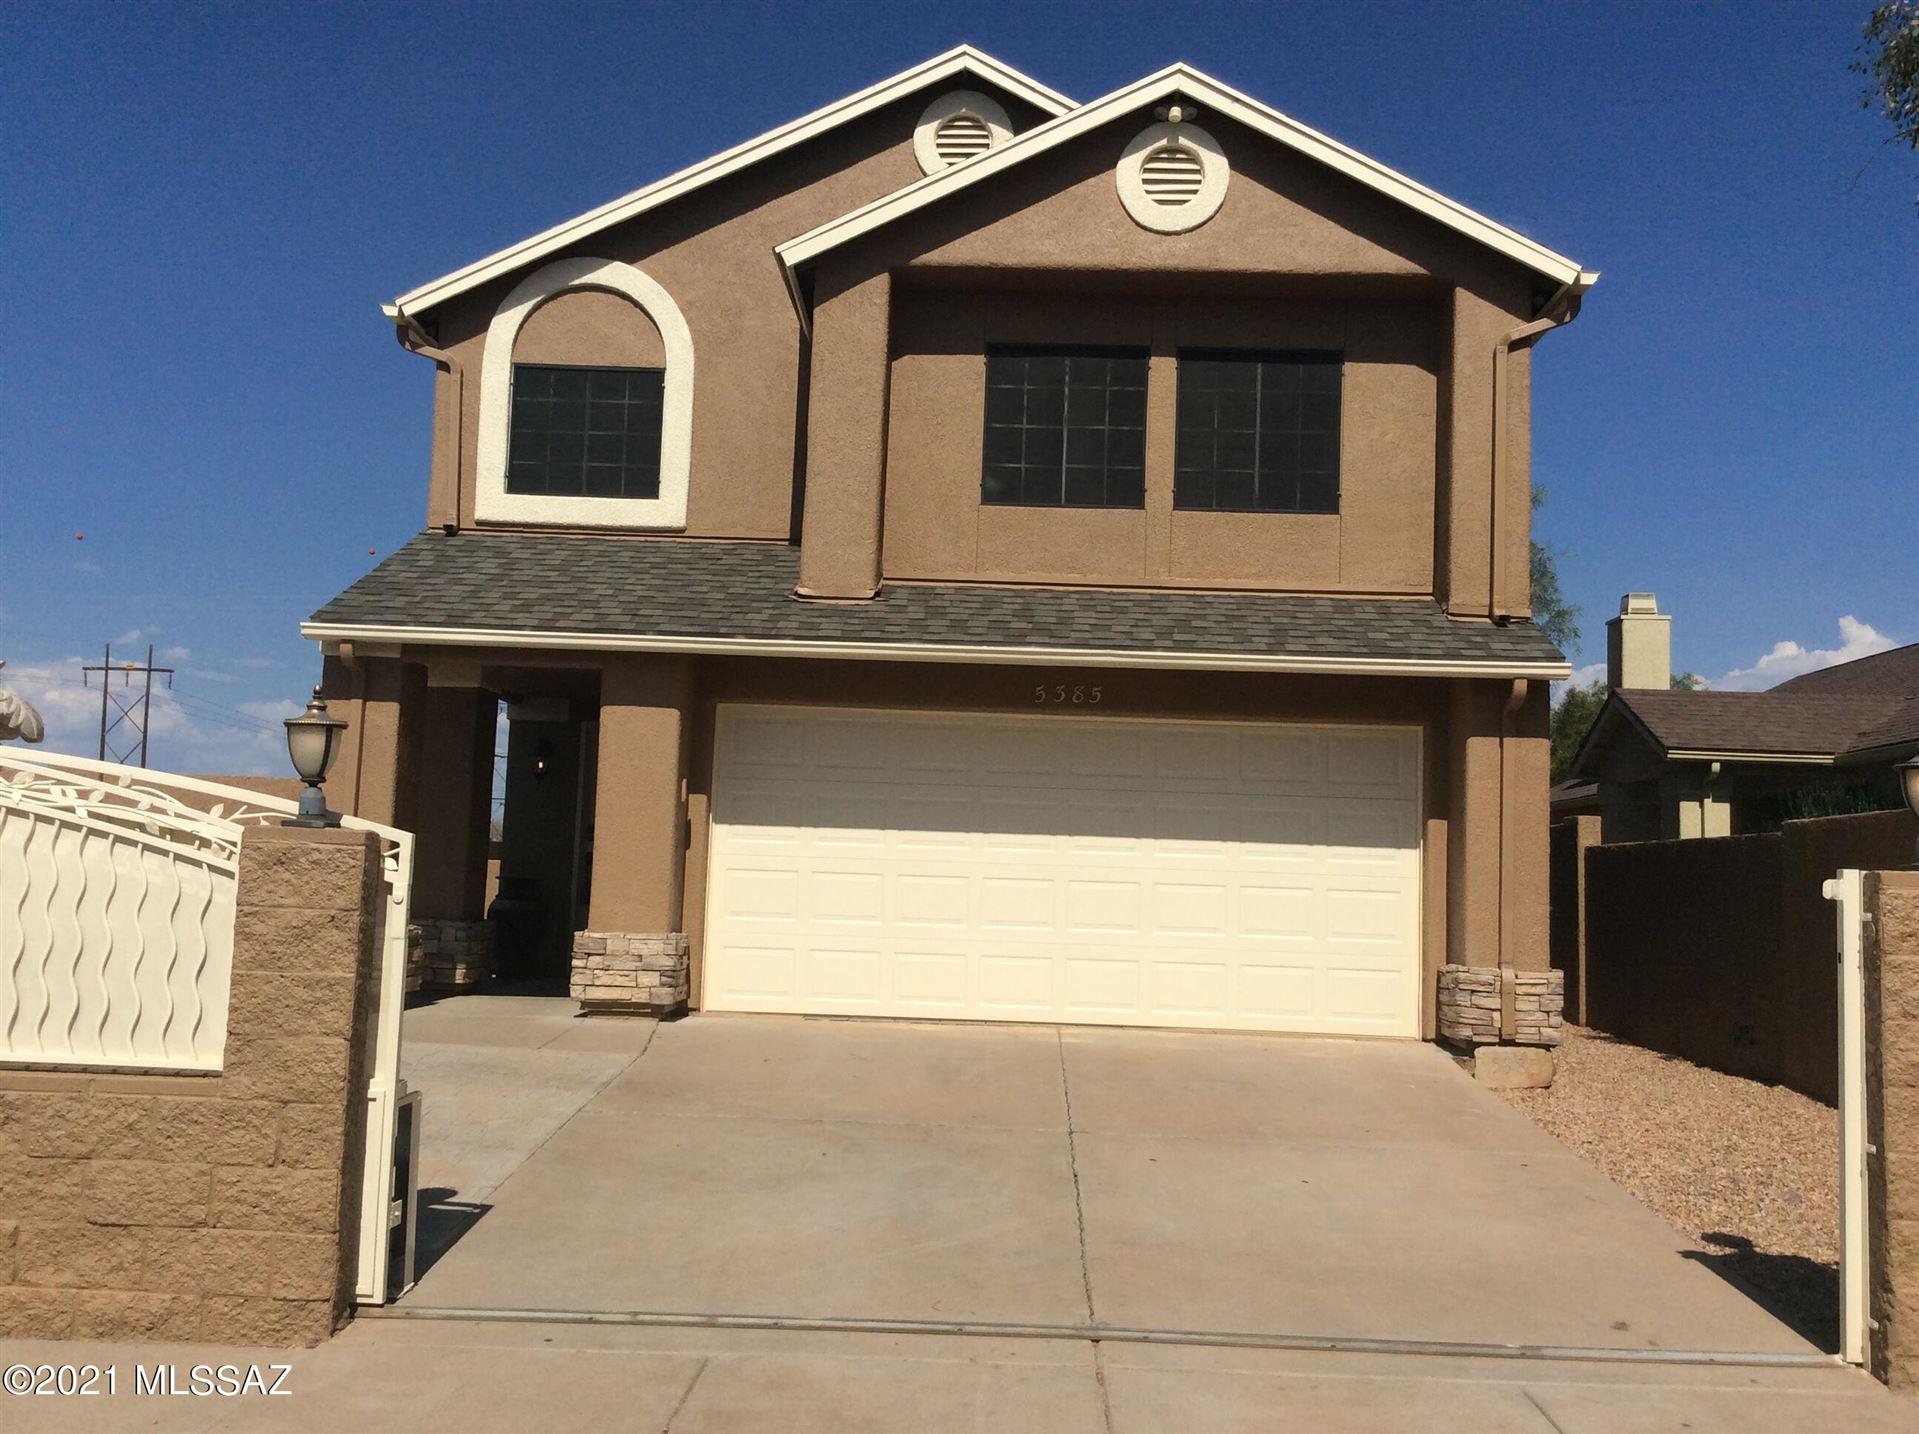 5385 S Wembly Road, Tucson, AZ 85746 - MLS#: 22117208